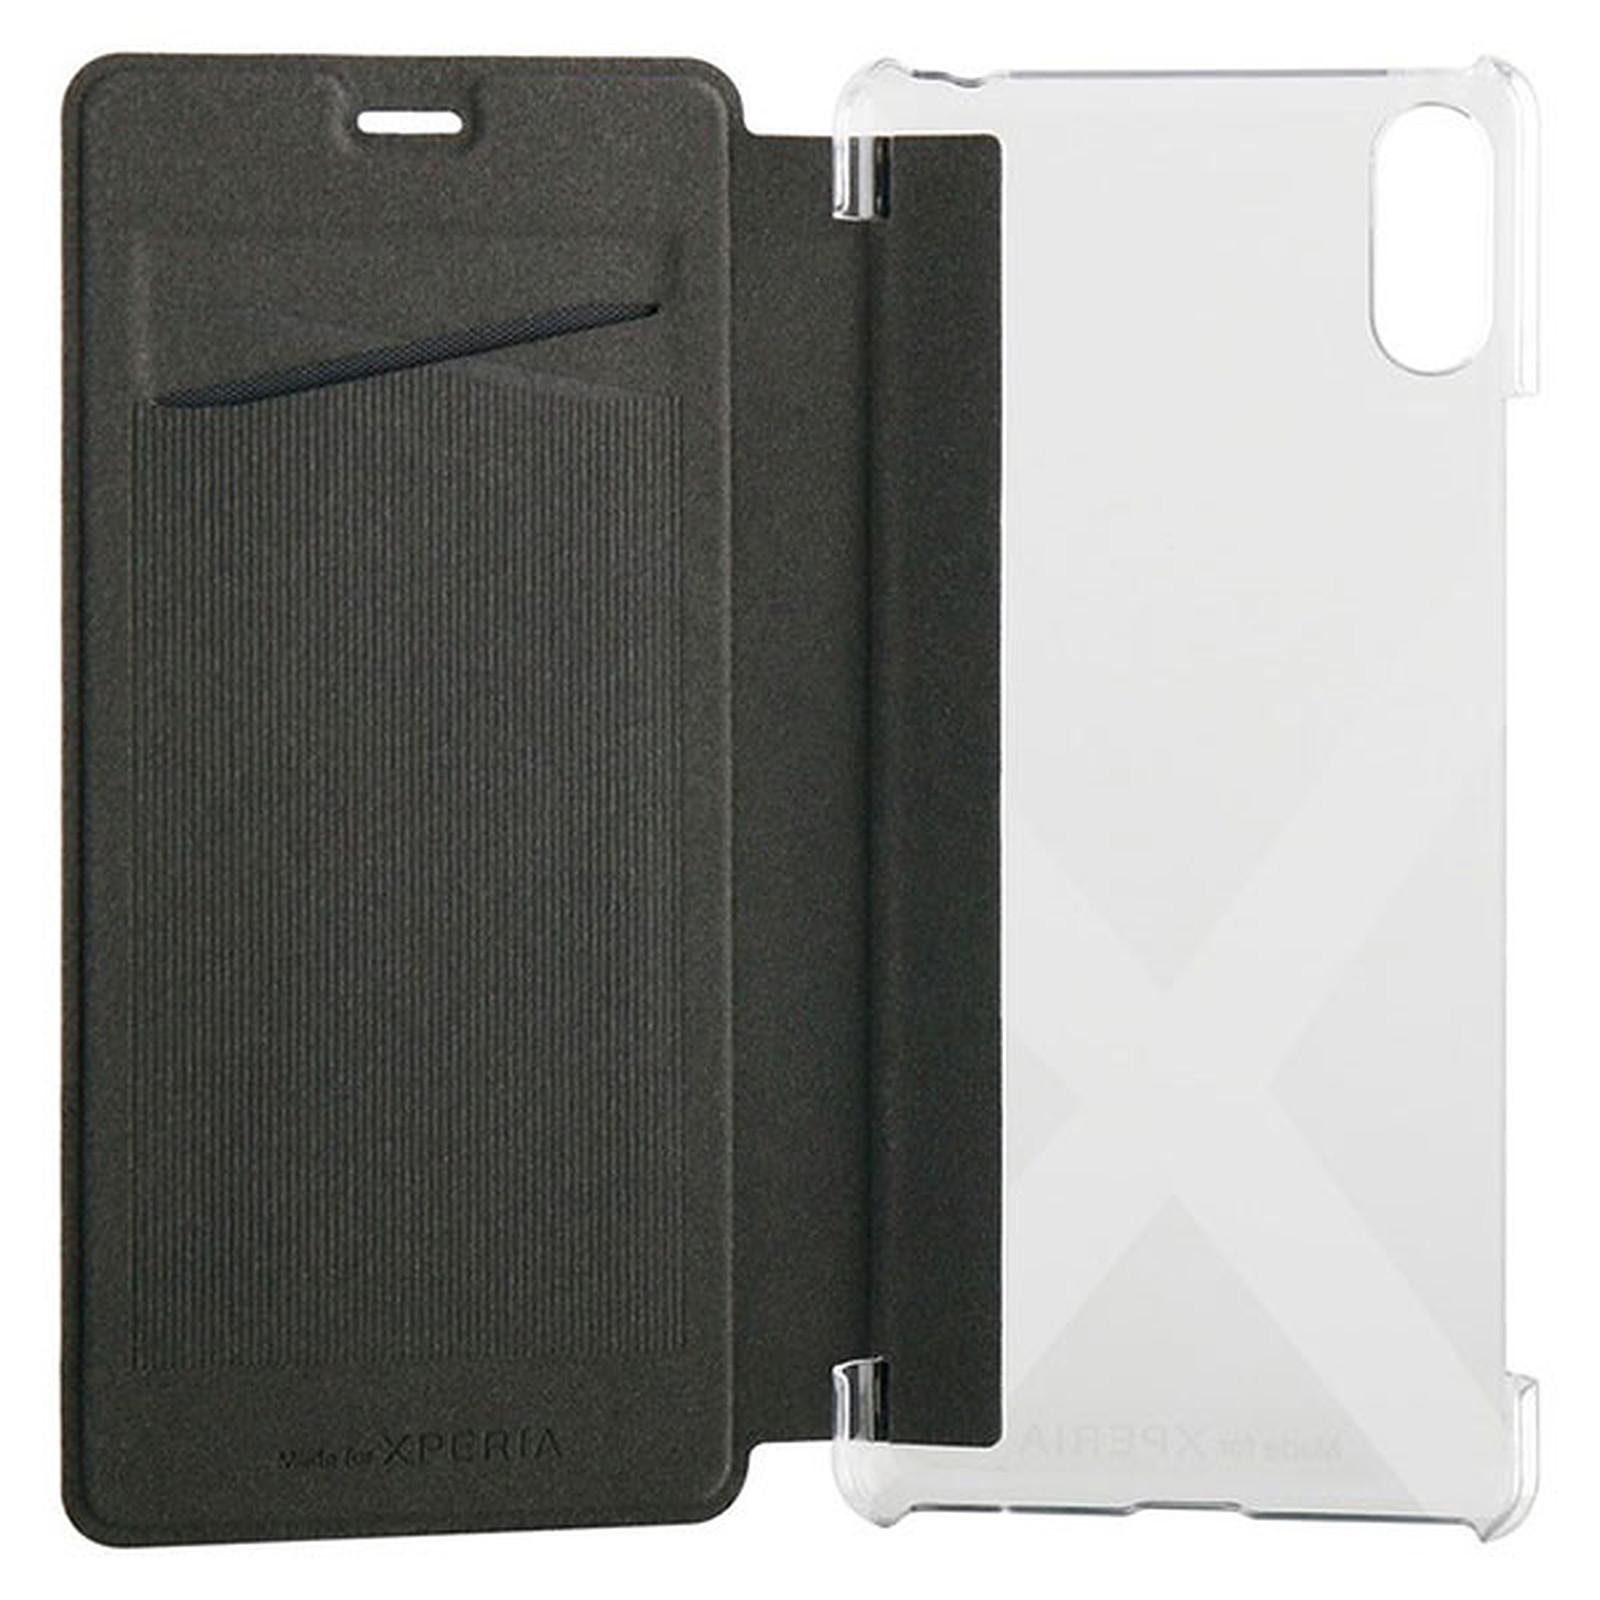 Made for Xperia Etui Folio Case Noir Sony Xperia L3